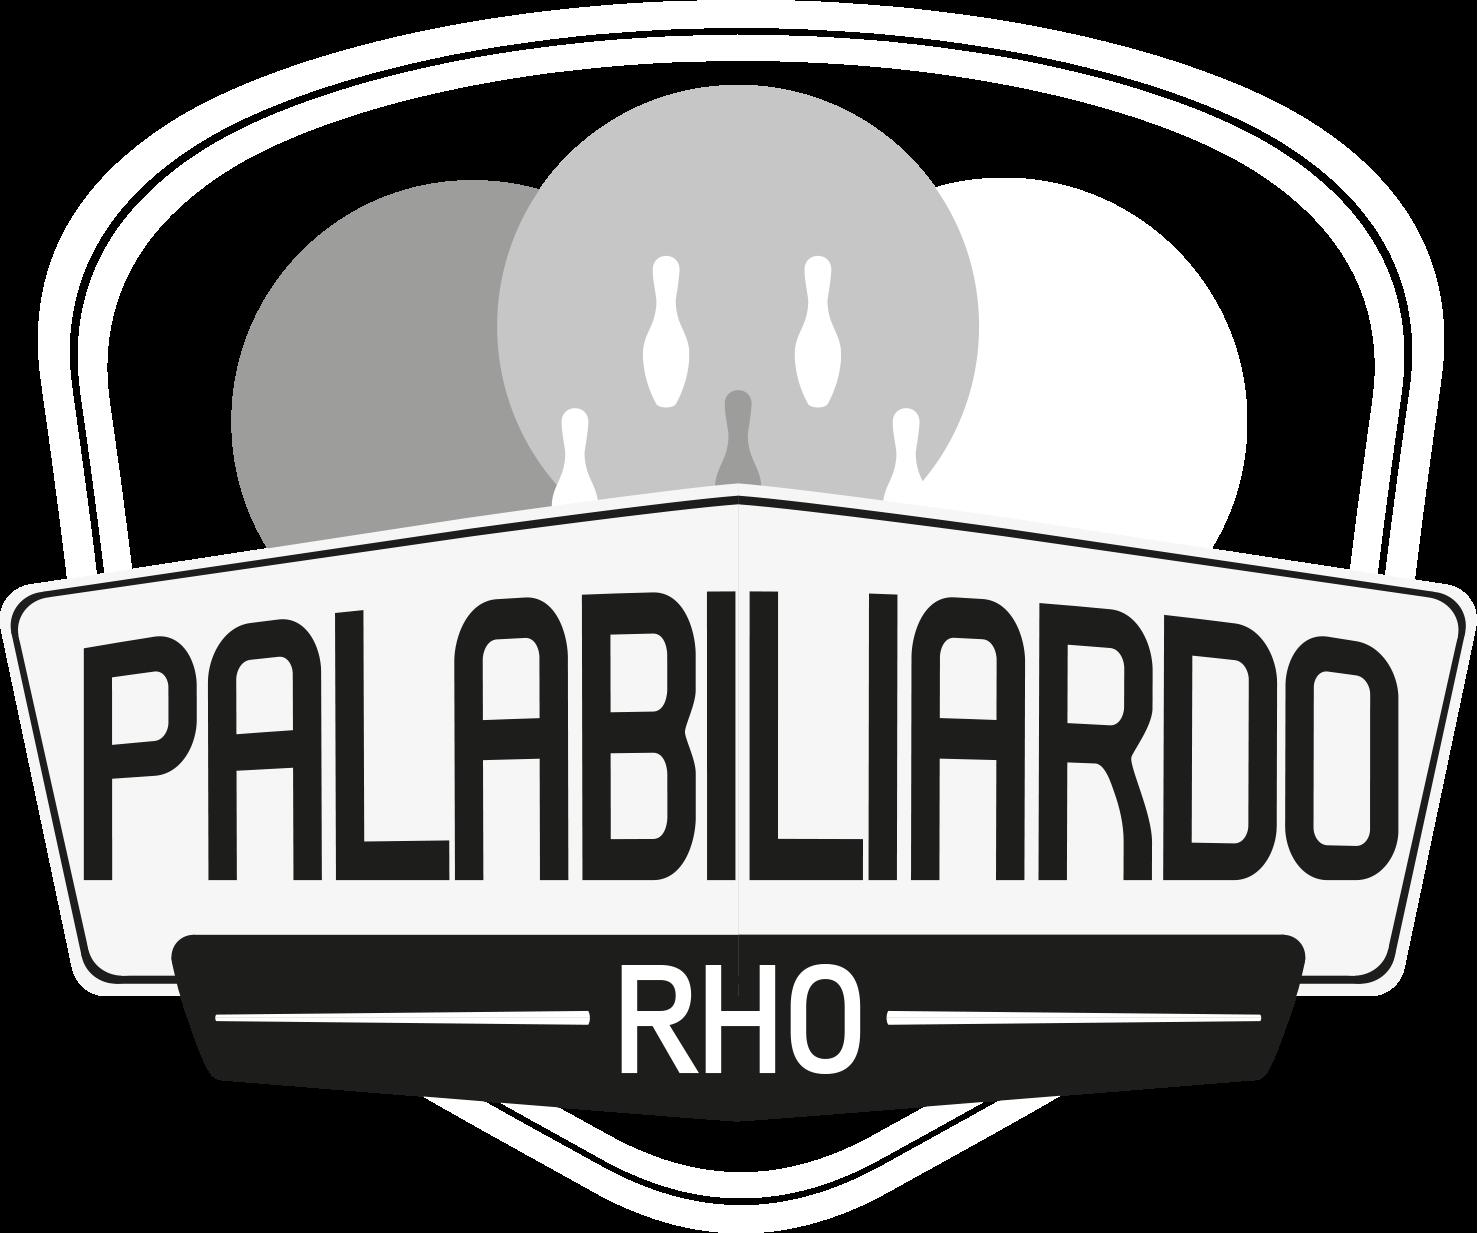 Palabiliardo RHO HOME - Palabiliardo RHO (Via Terrazzano 93, RHO)